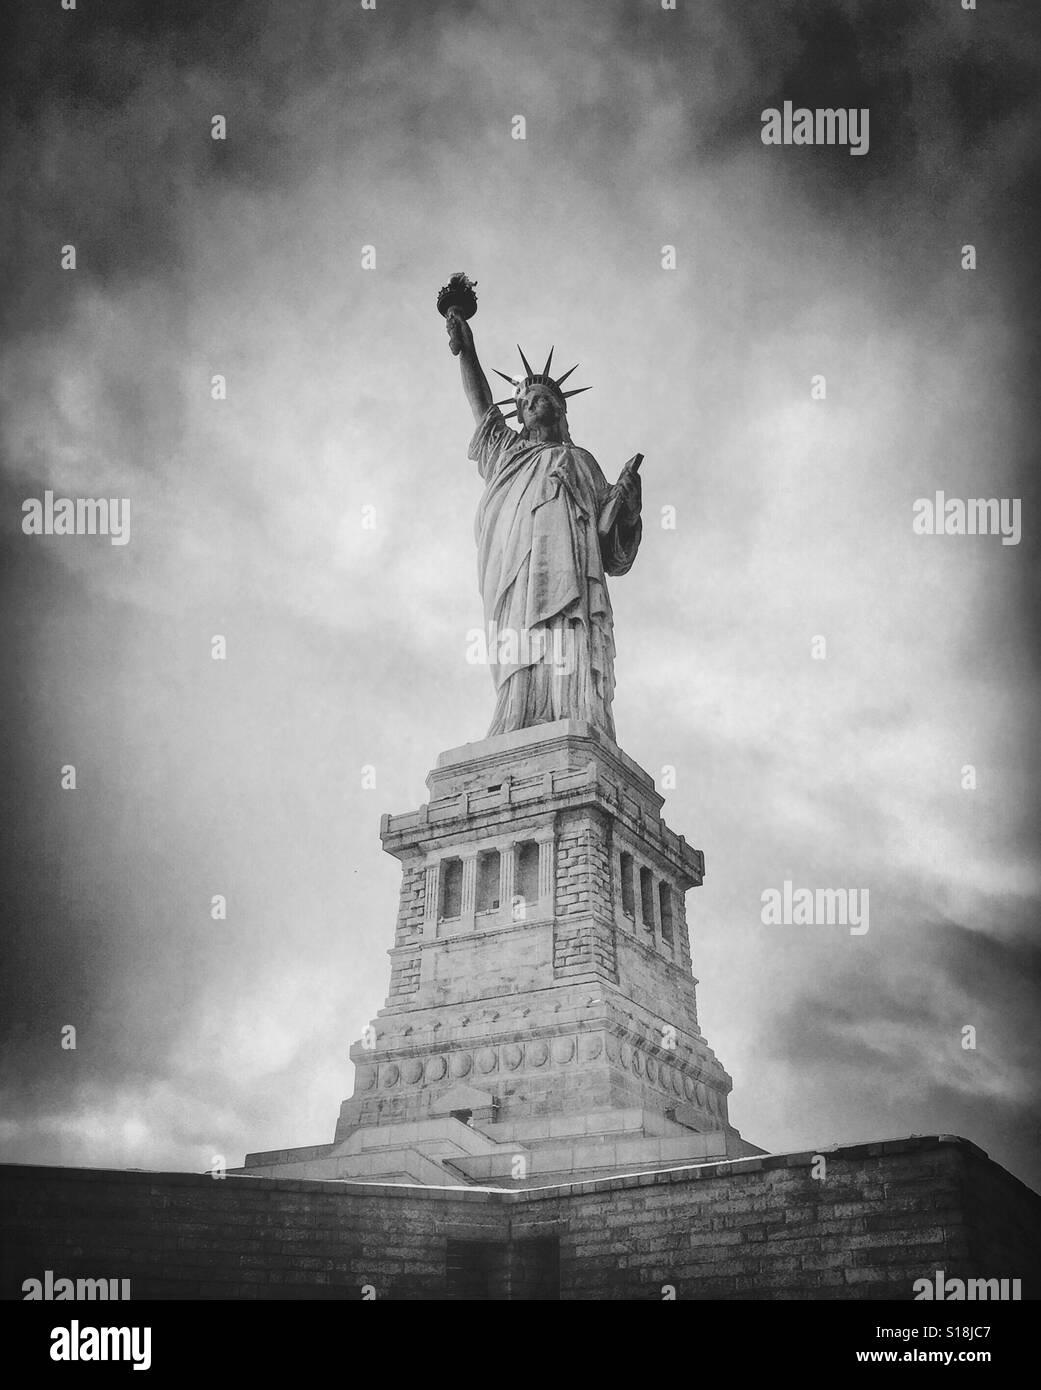 Freiheitsstatue - New York - super Fine Art-Fotografie Stockbild